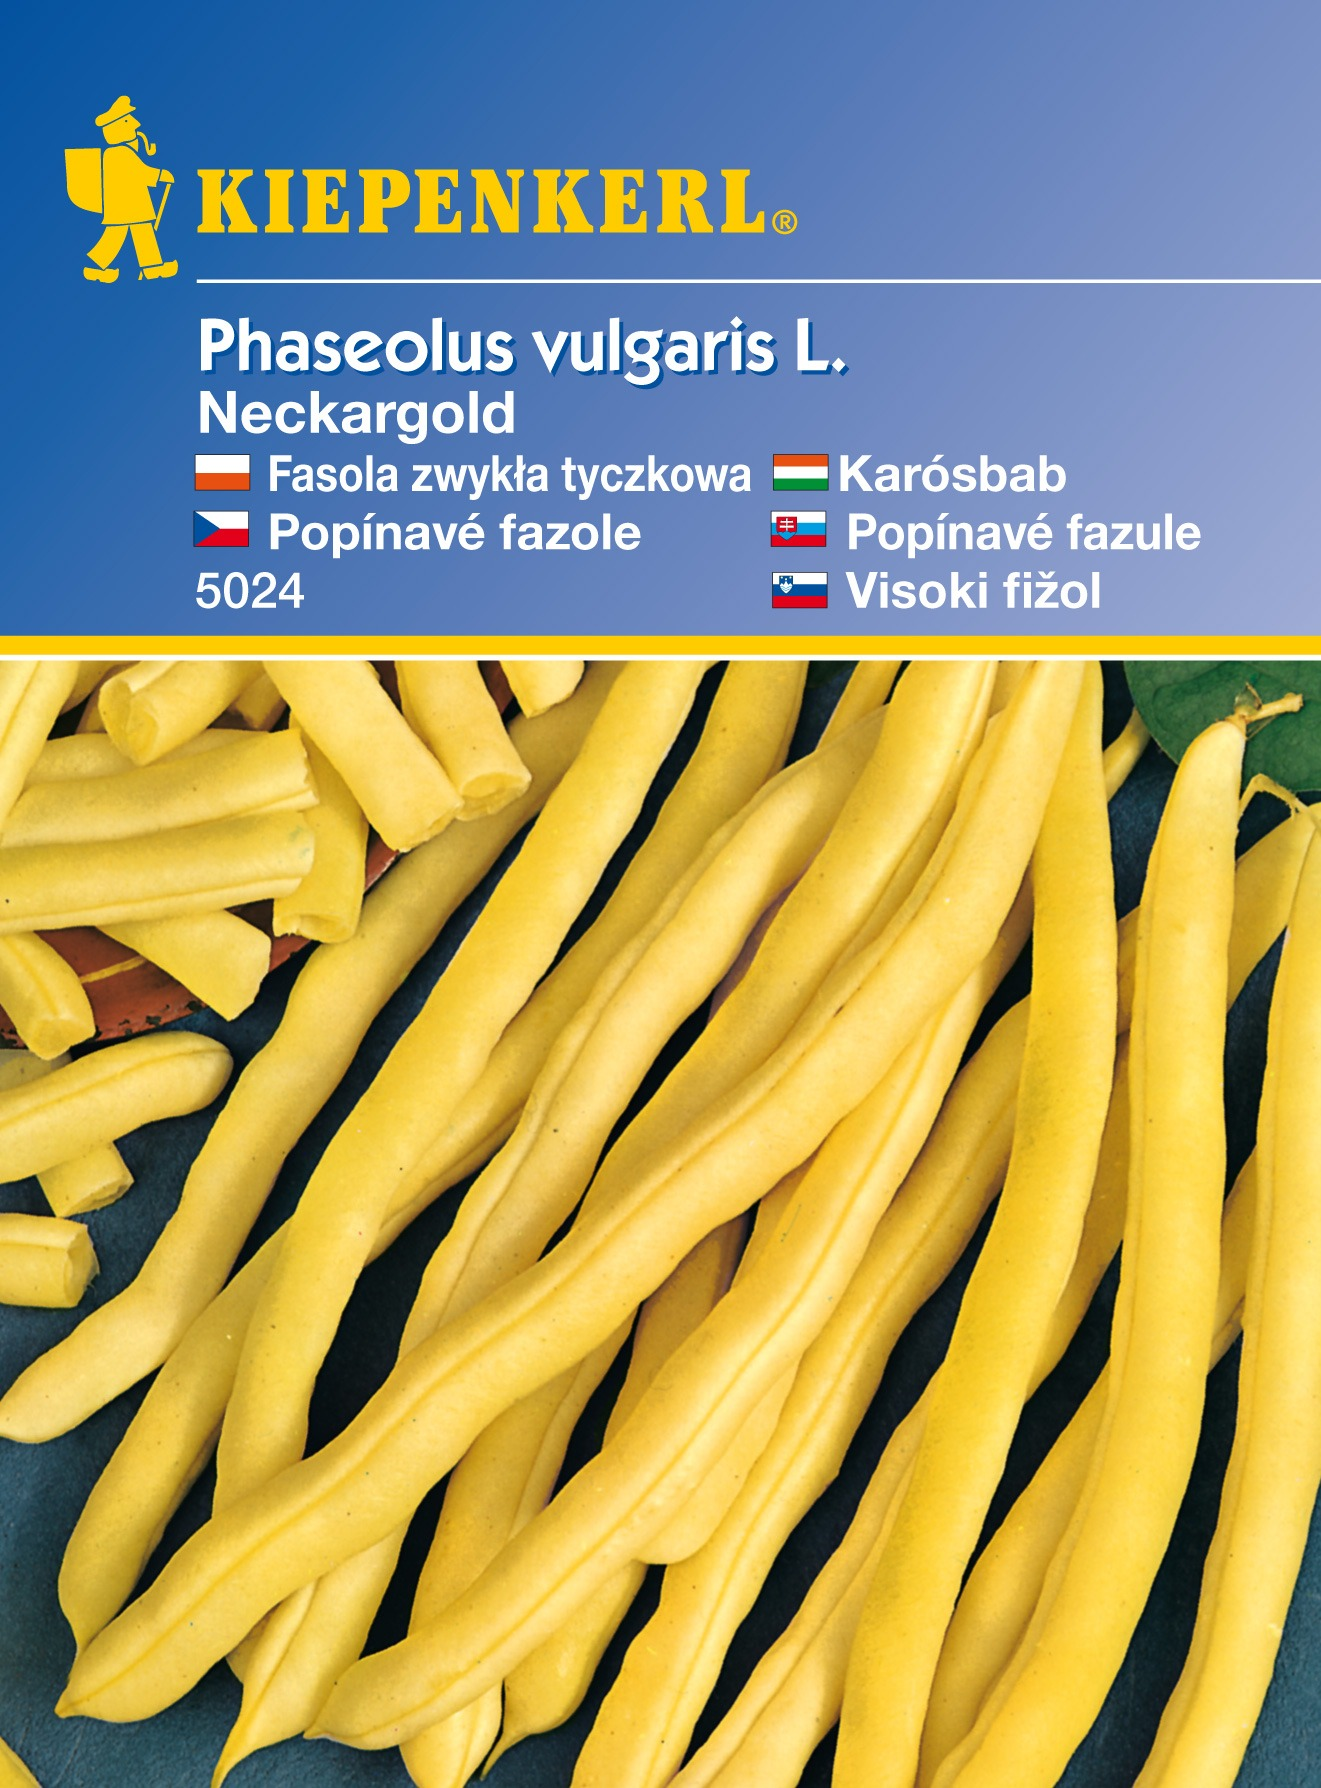 Popínavá fazole Neckargold – semena fazole